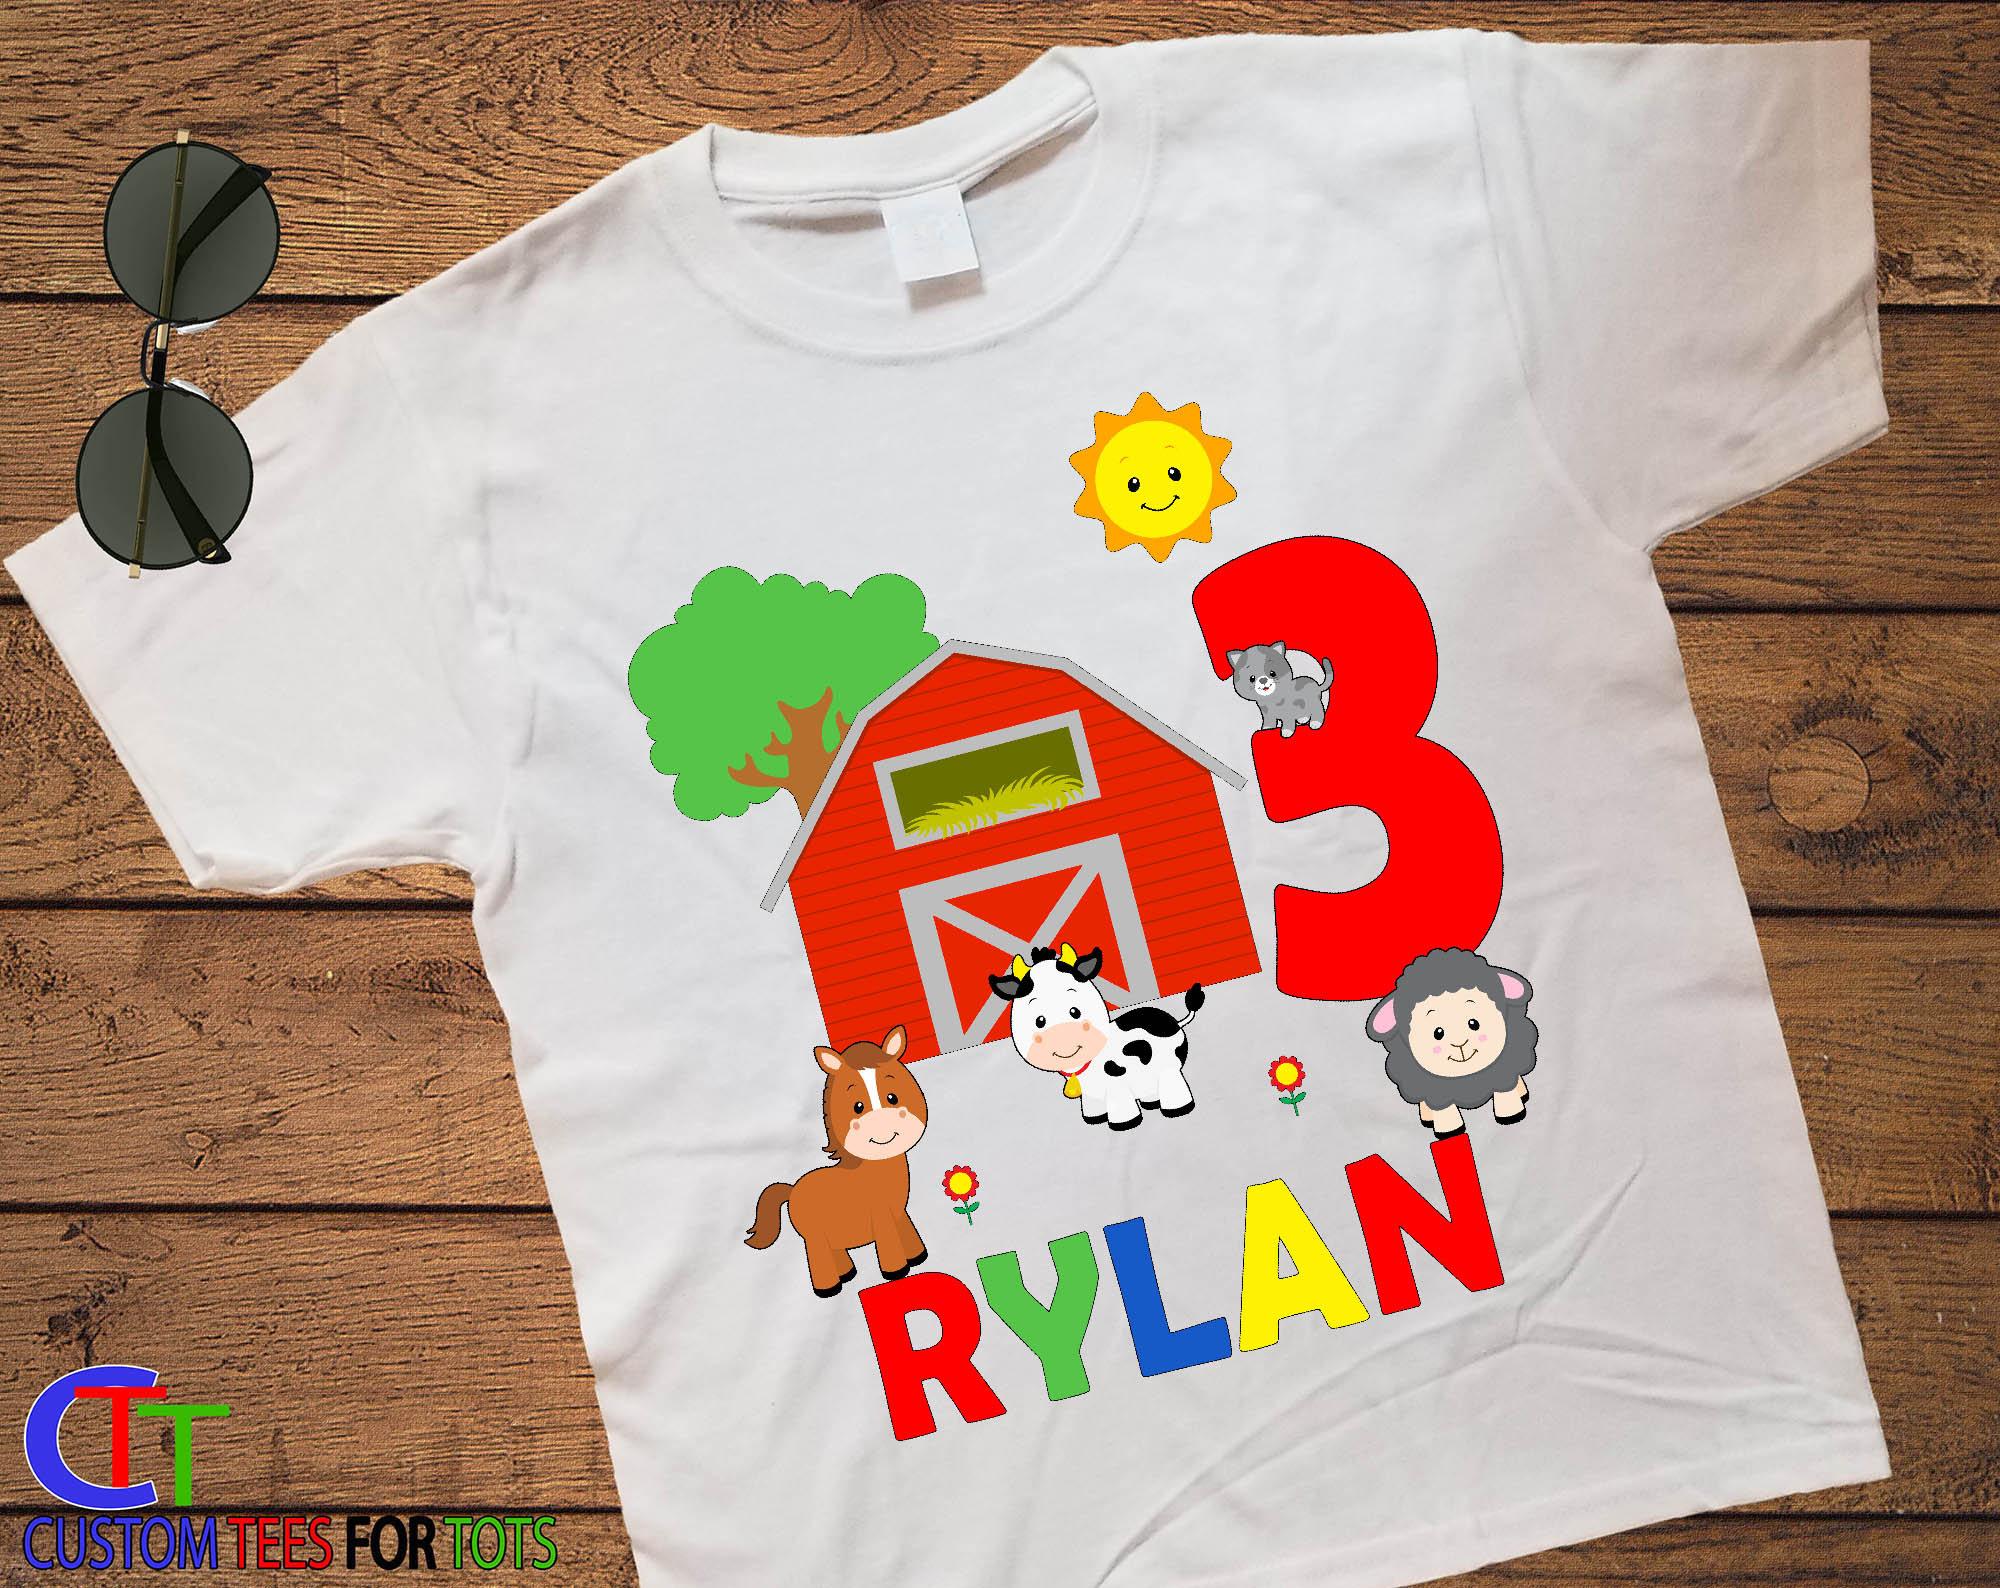 ce47b5dd Farm Animal Birthday Shirt - Boys Personalized Farm Birthday Shirt ...